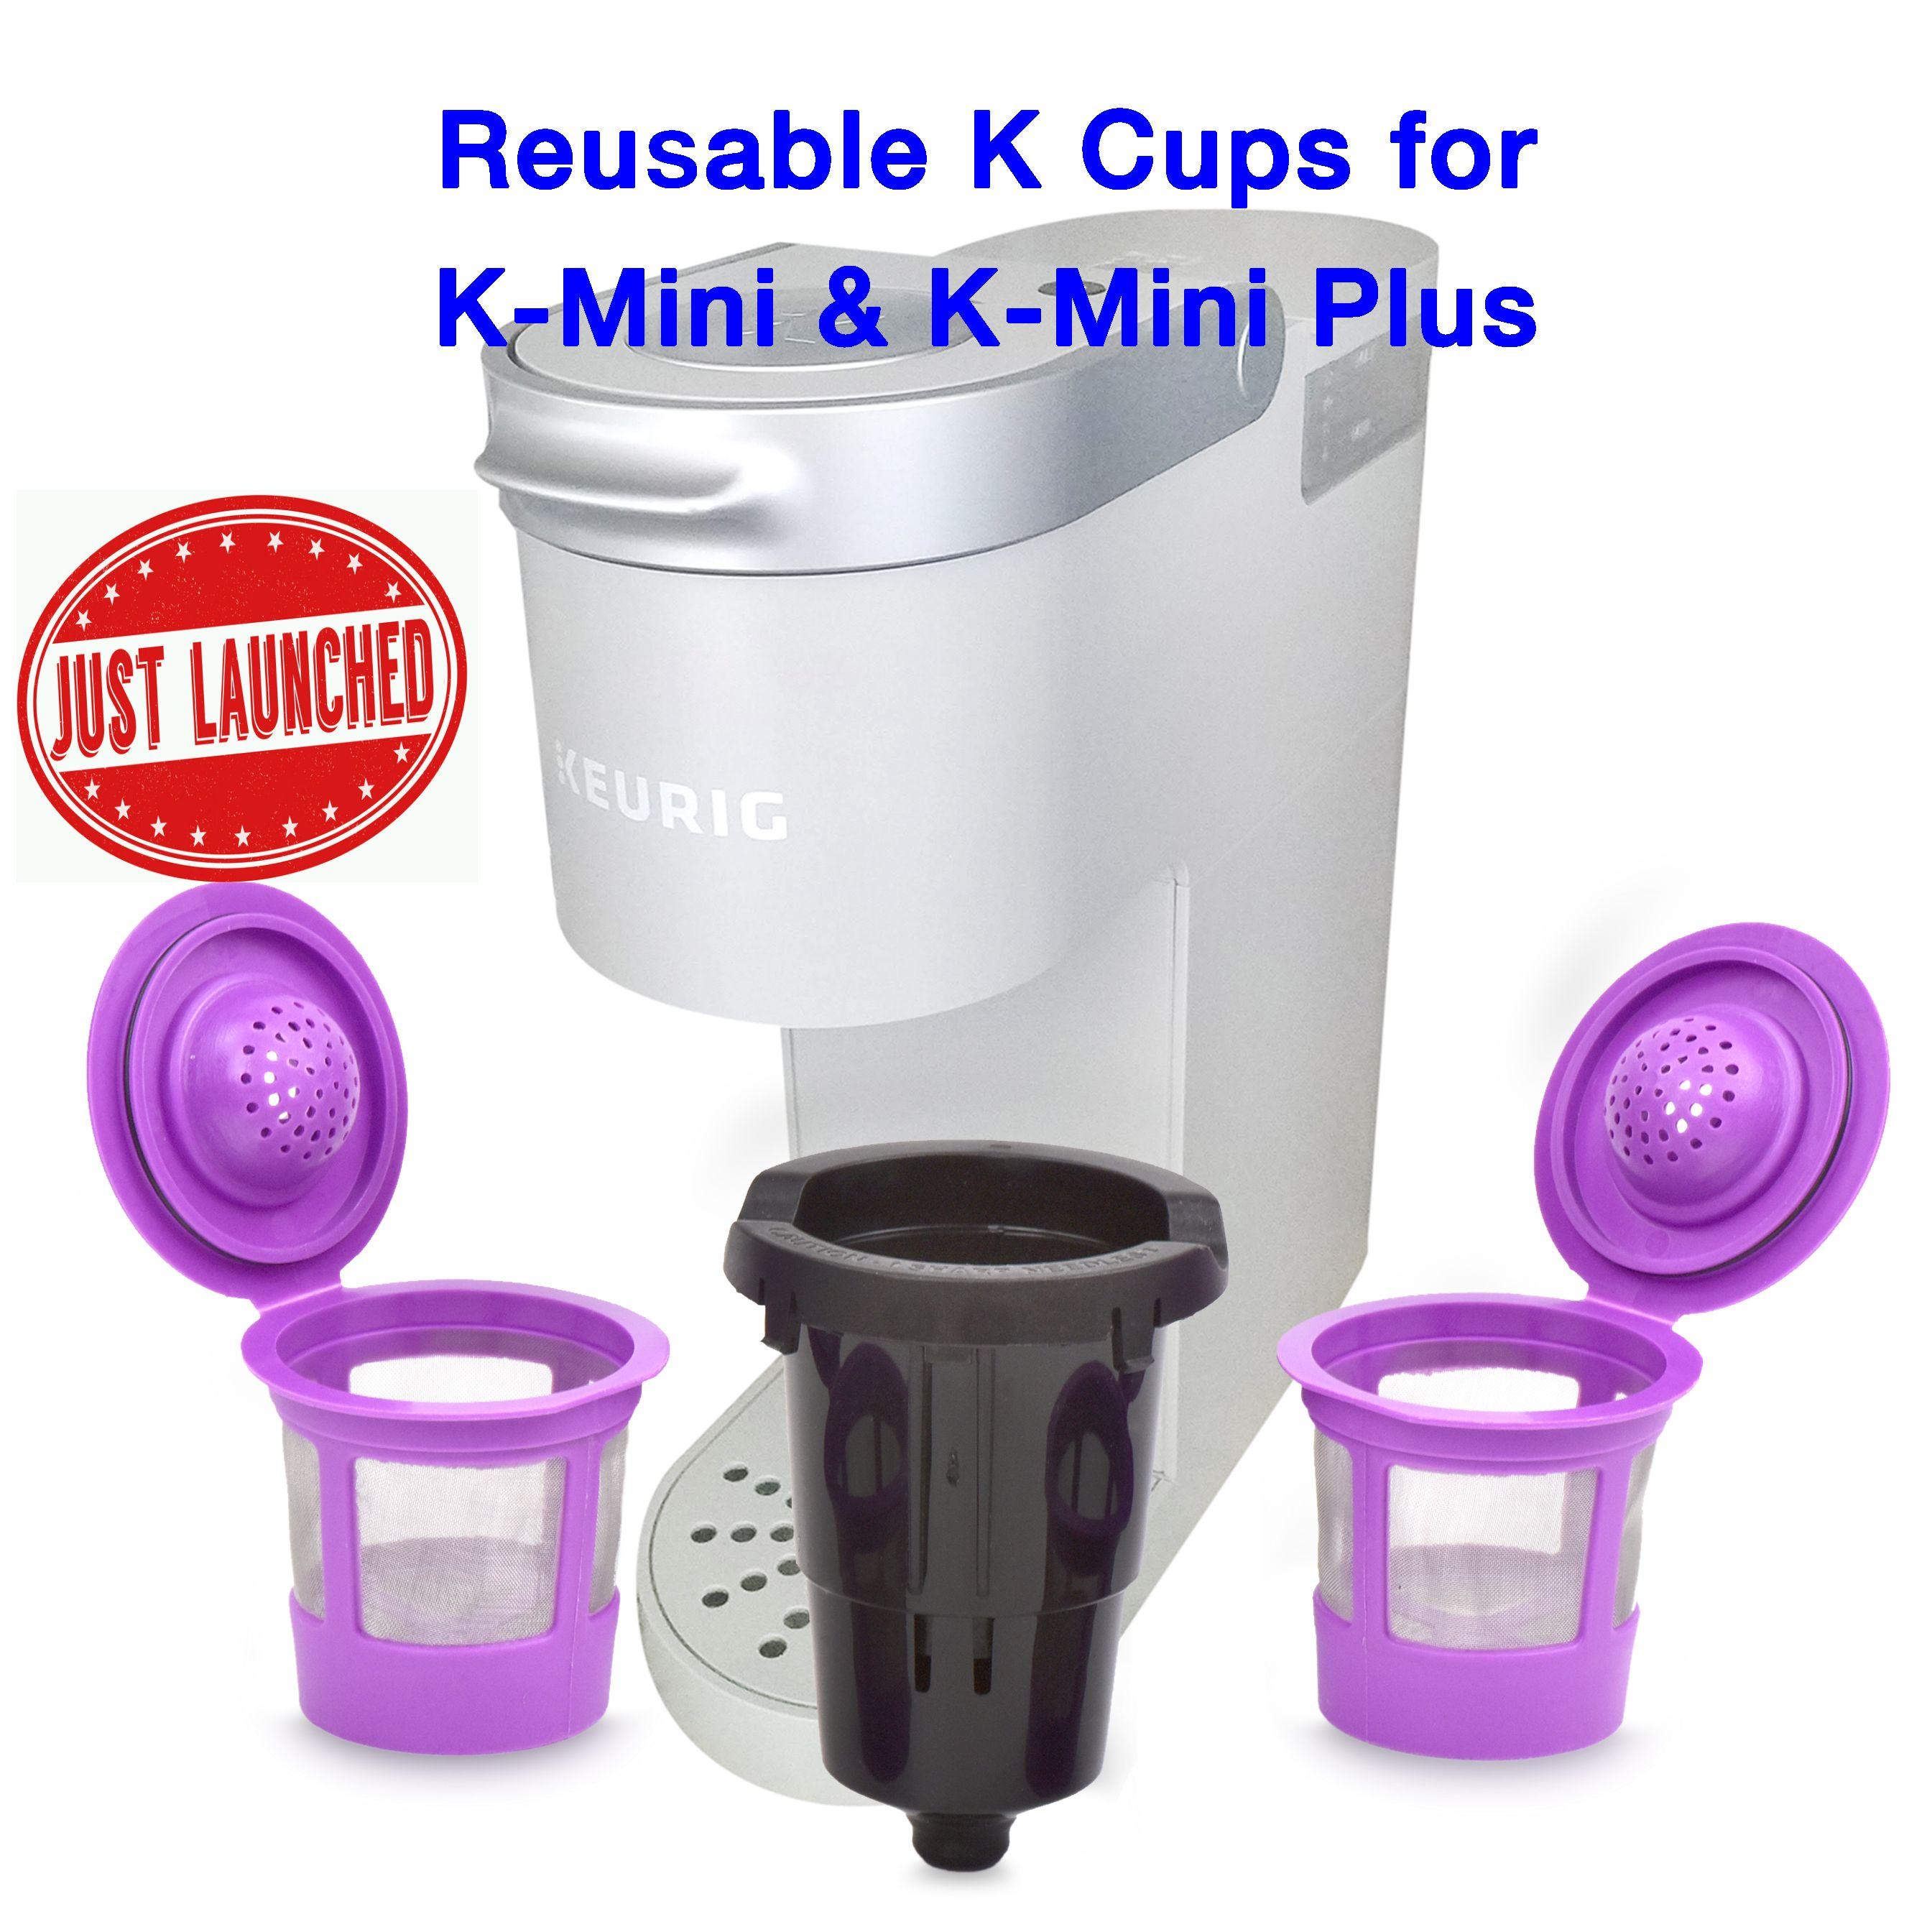 Reusable K Cups for K-Mini K-Select and Keurig Mini Plus